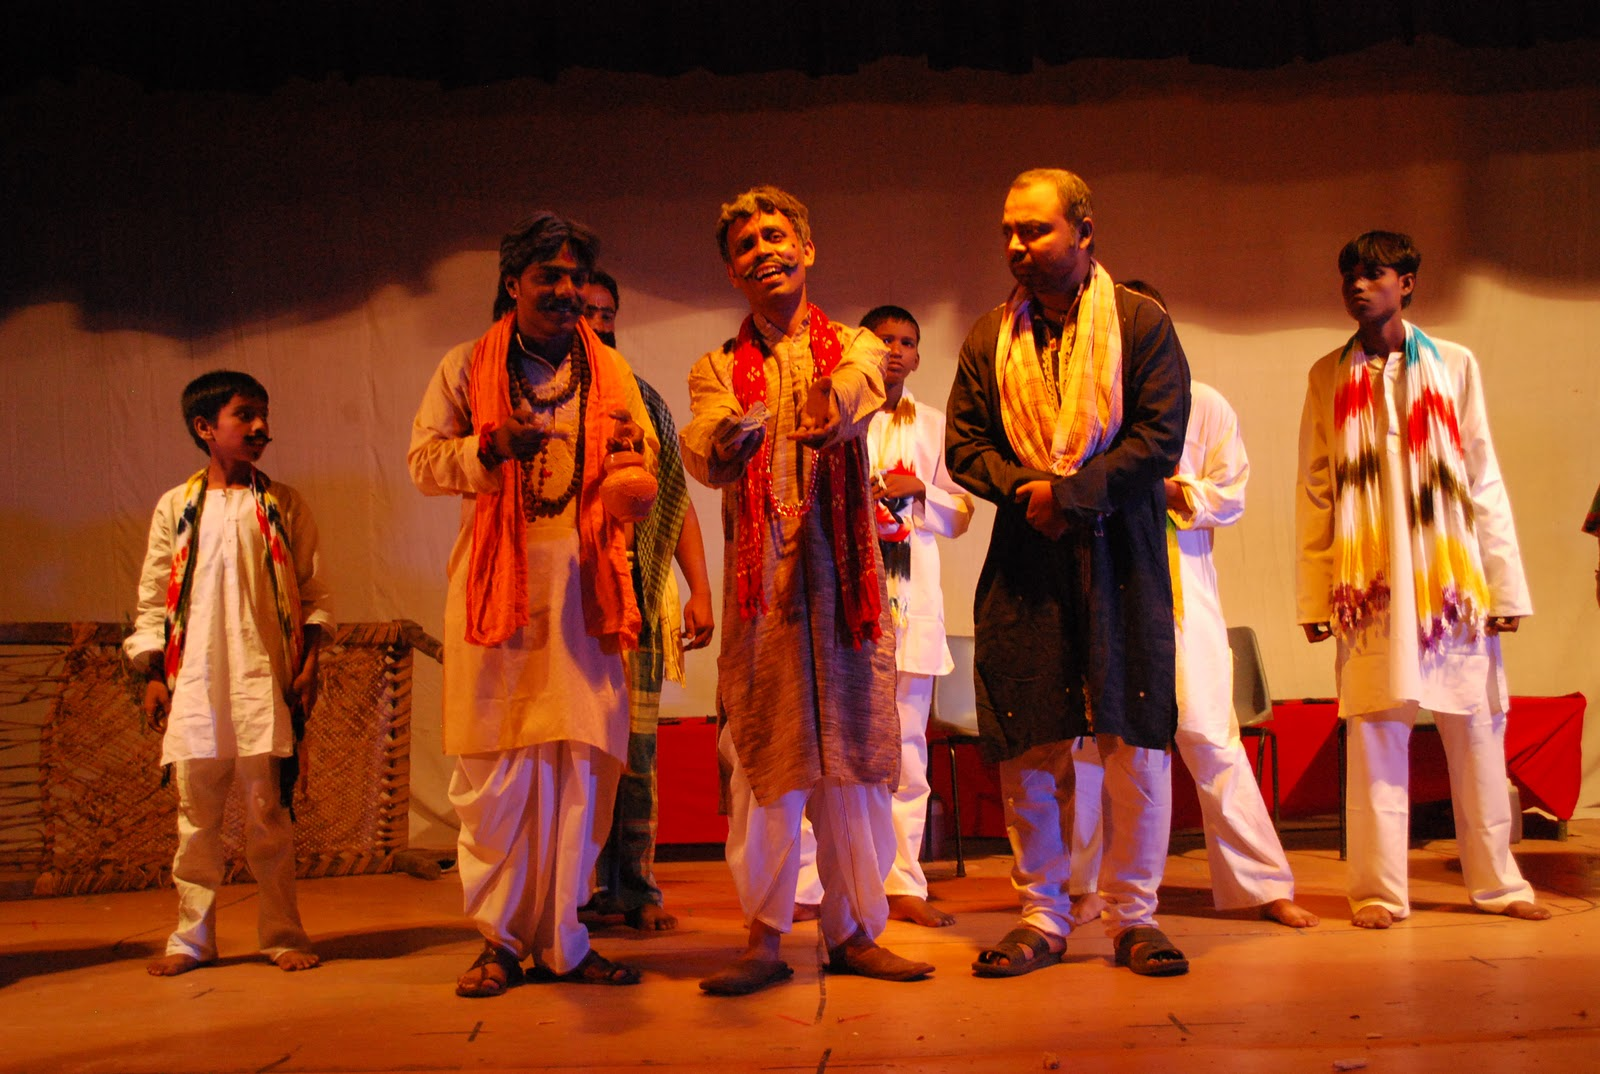 Anukriti Kanpur December 2011